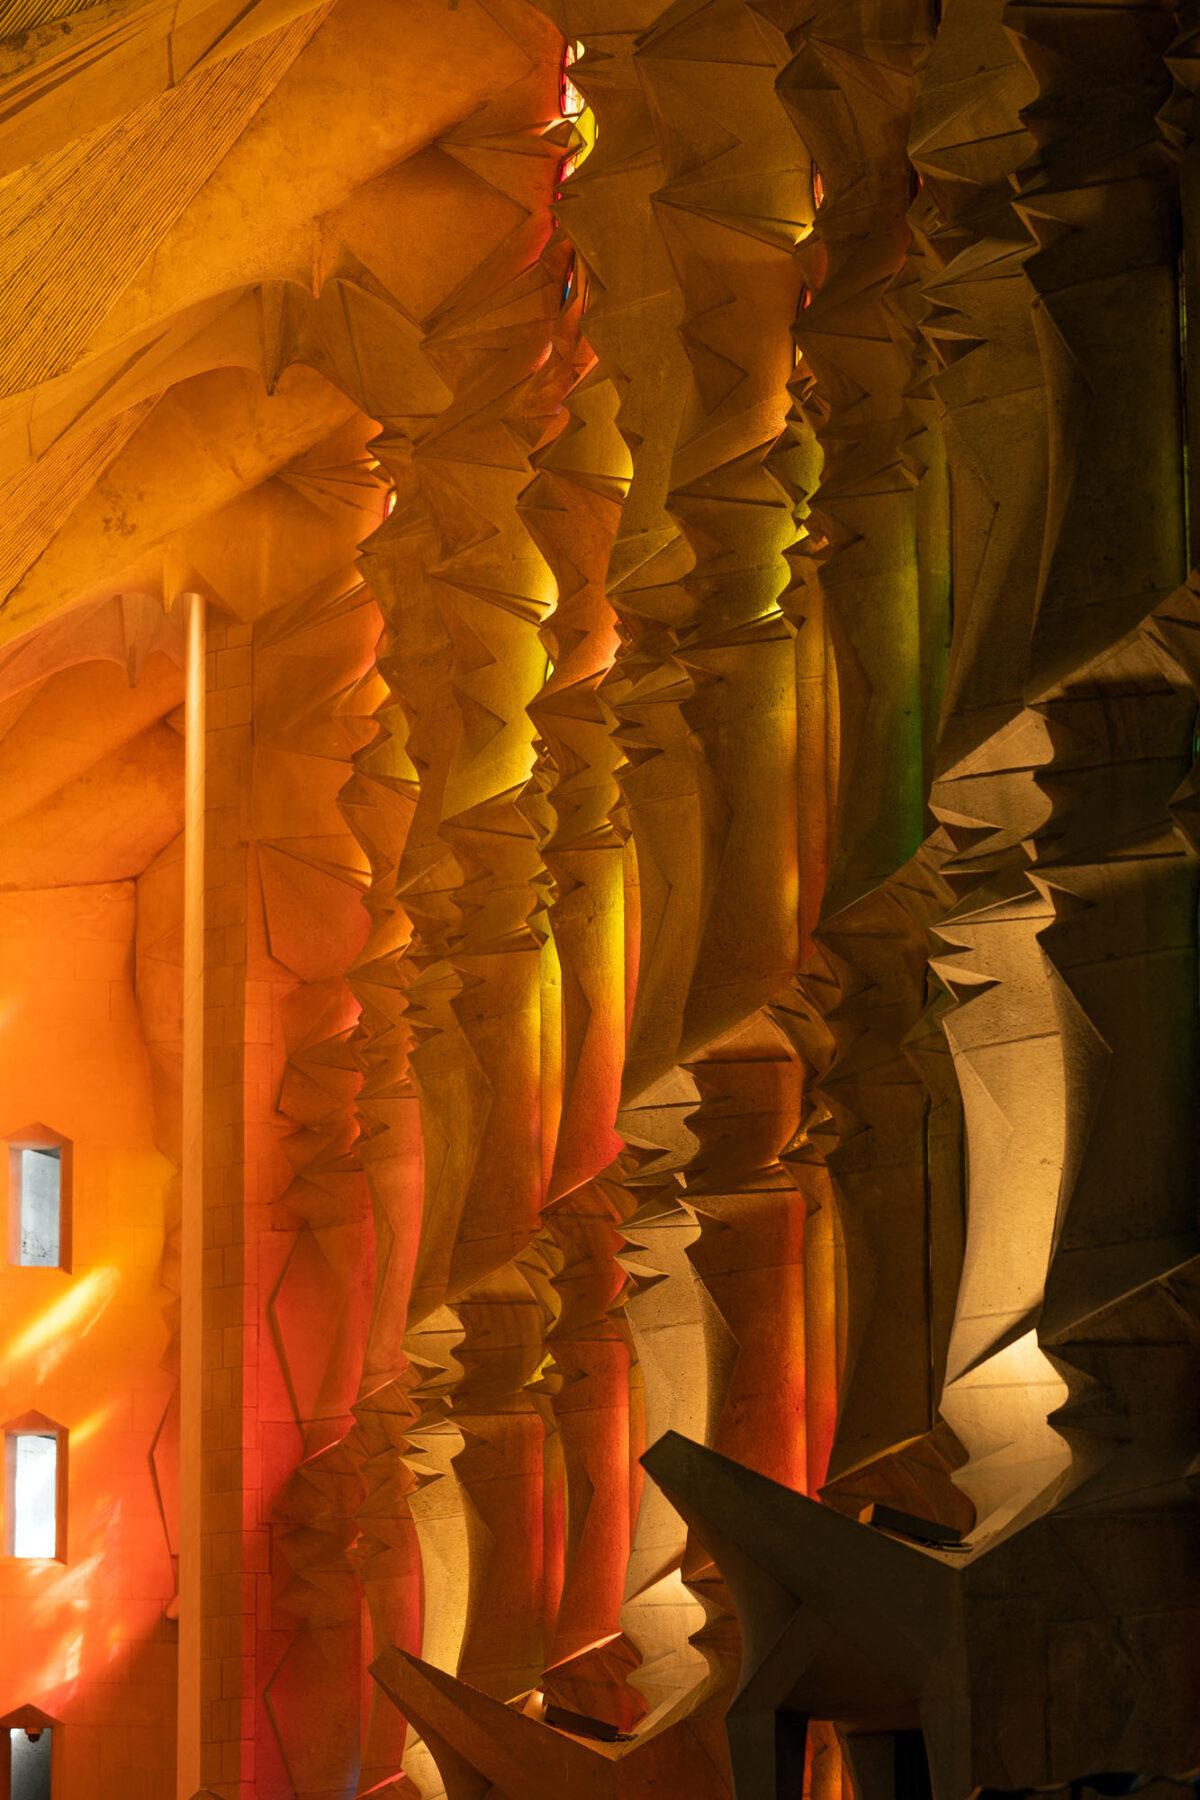 64 Barcelona Sagrada Valencia DSC 4325